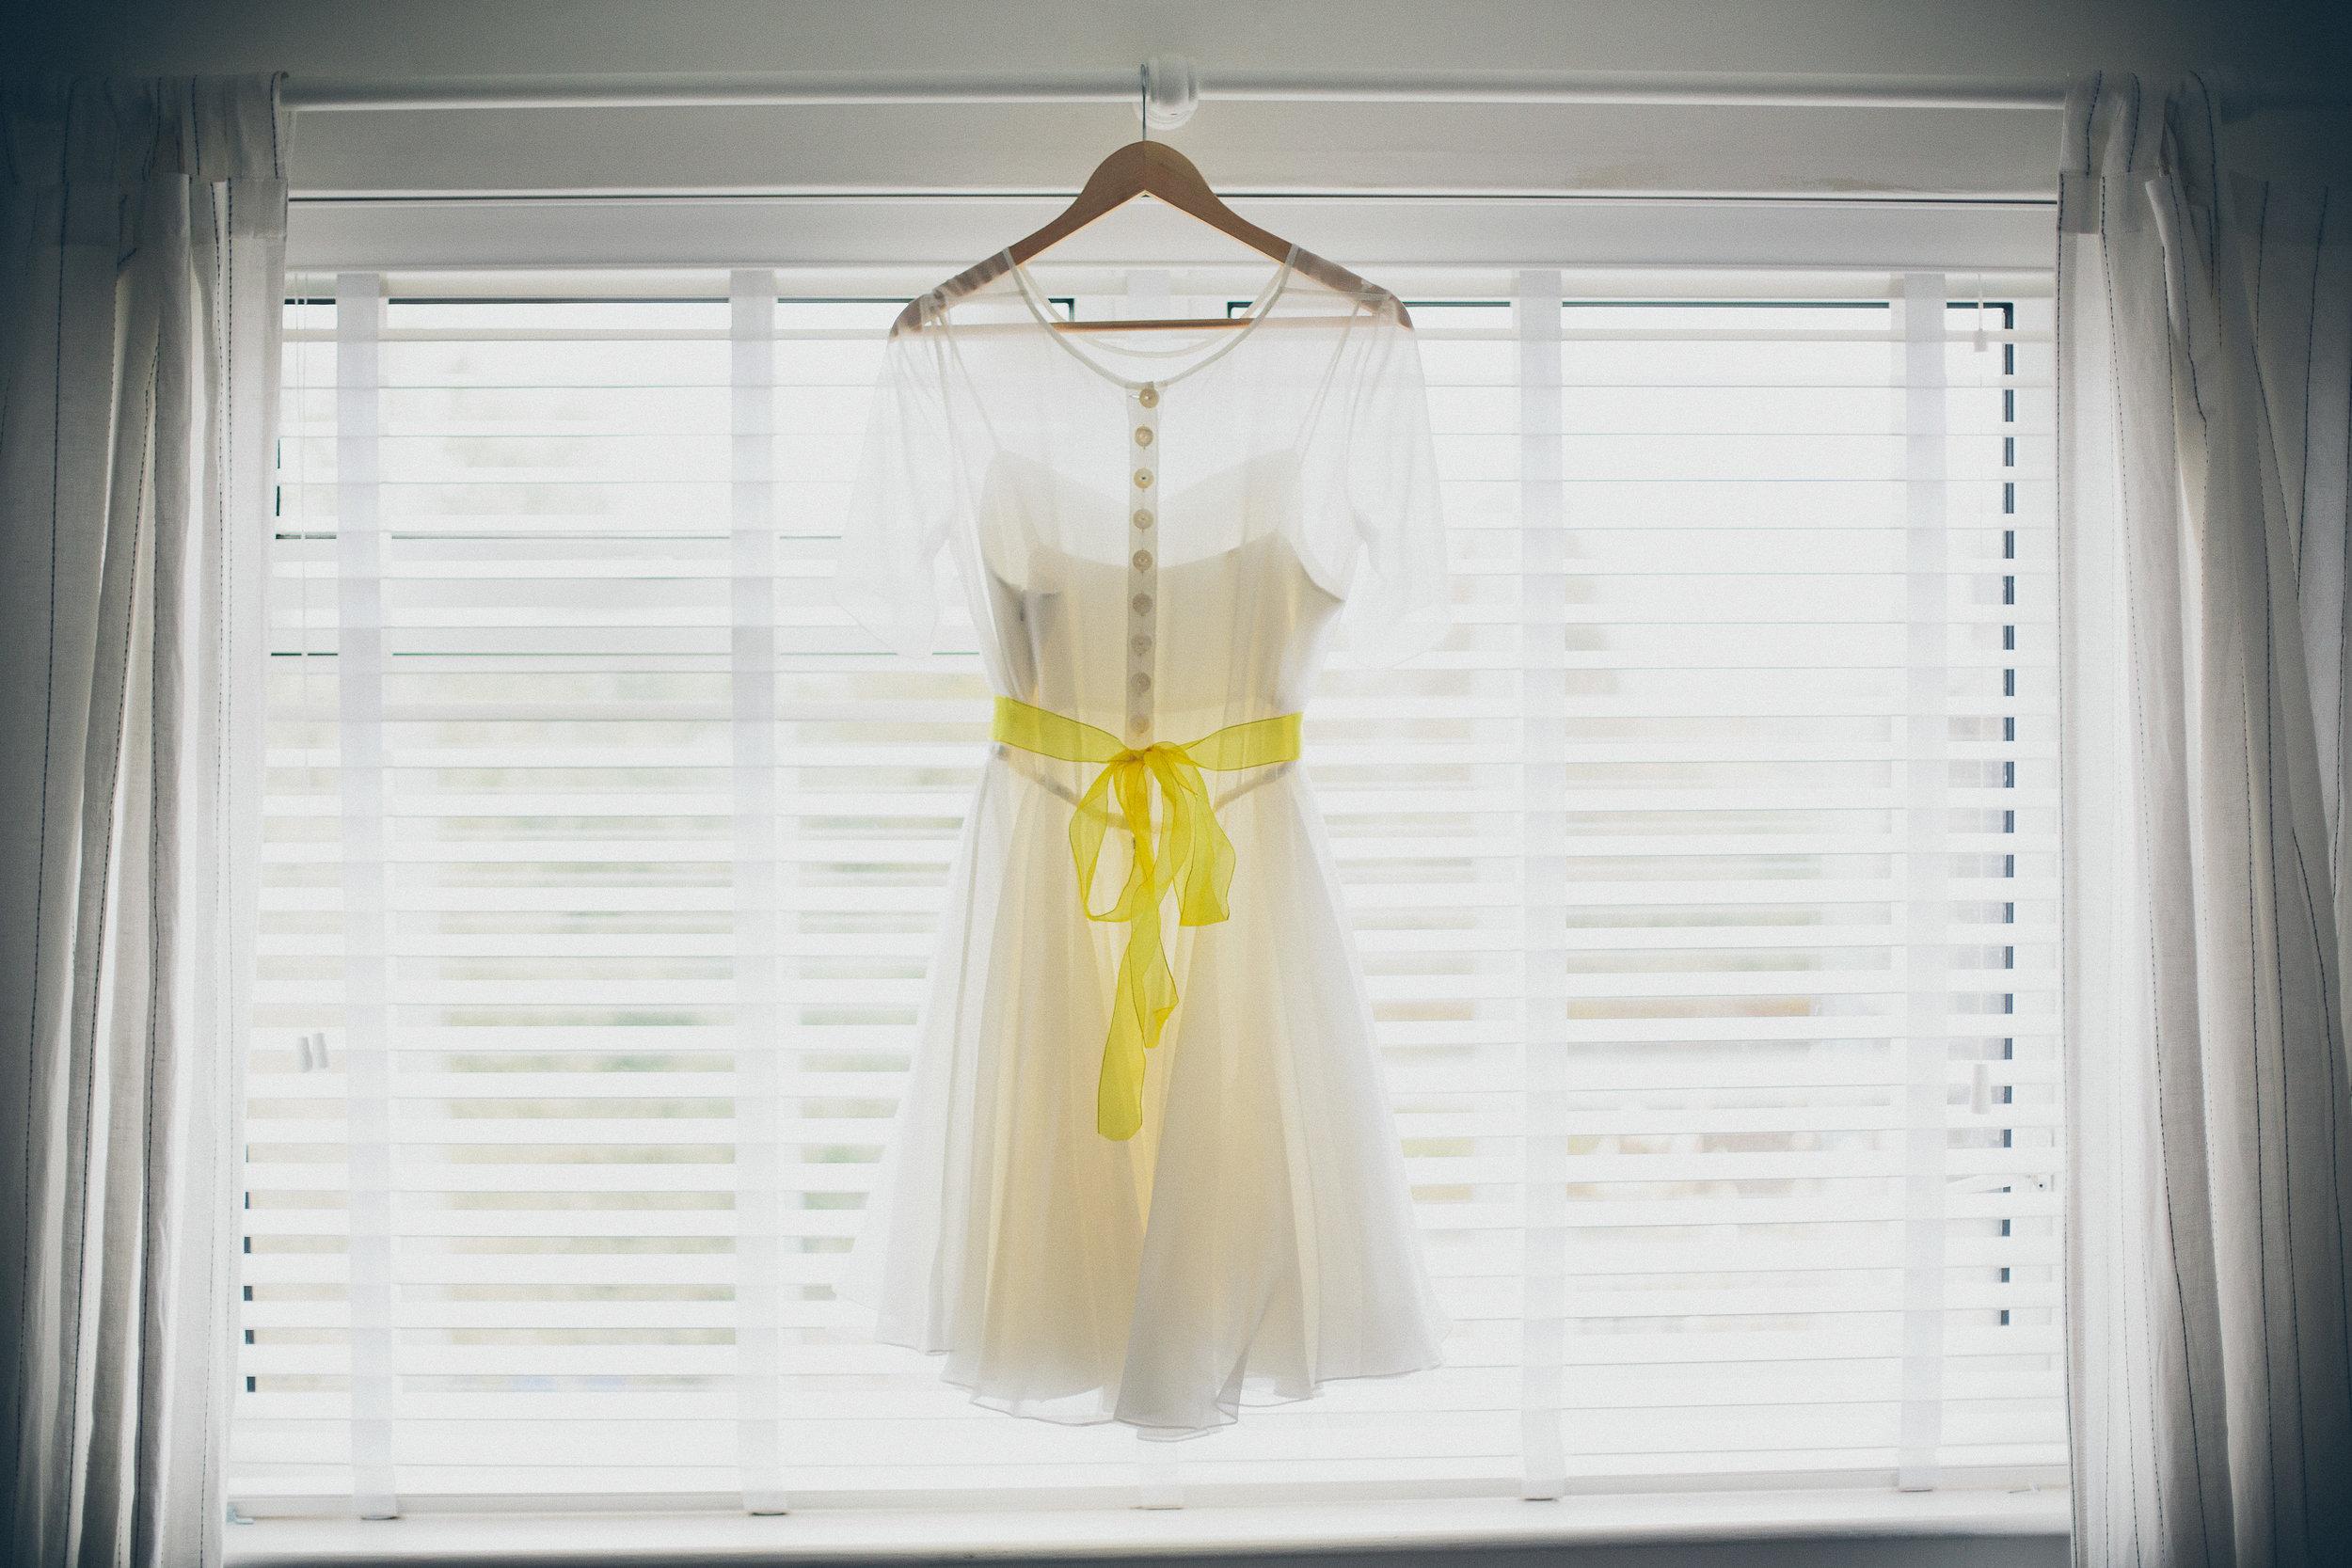 Sophie-Matlock-Bespoke-Vintage-Tea-Length-Wedding-Dress-Susanna-Greening-Derbyshire-2